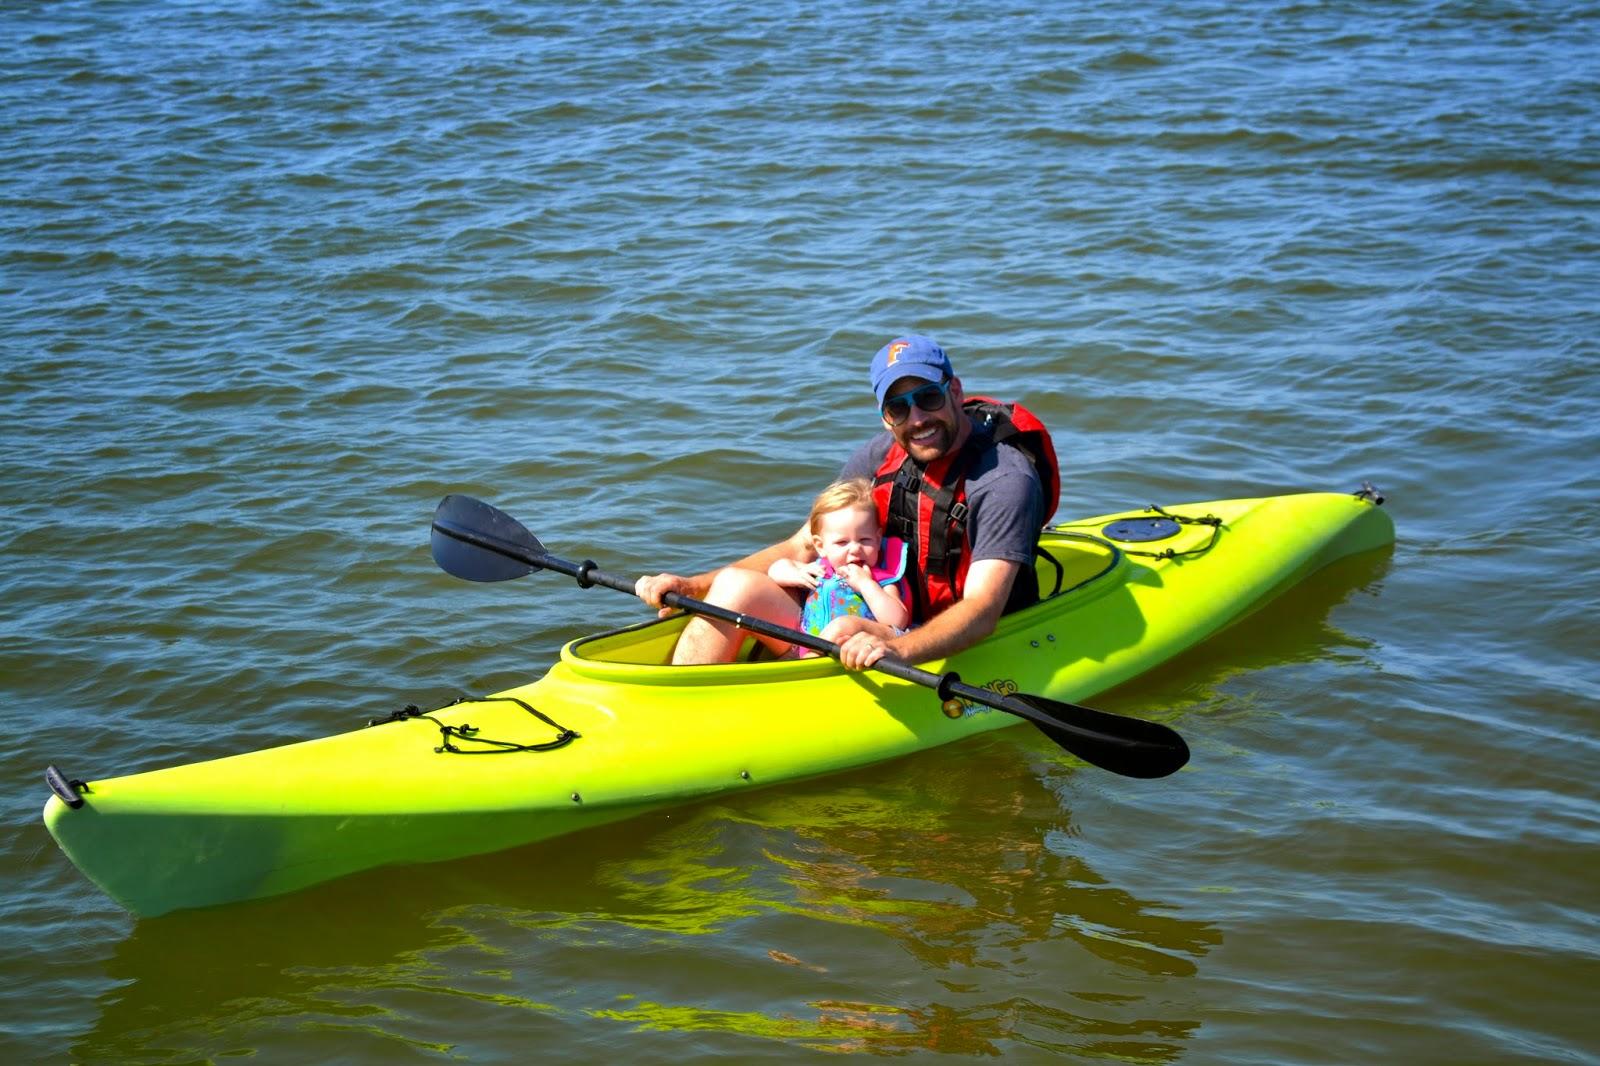 Bekahs First Kayak Ride With Daddy